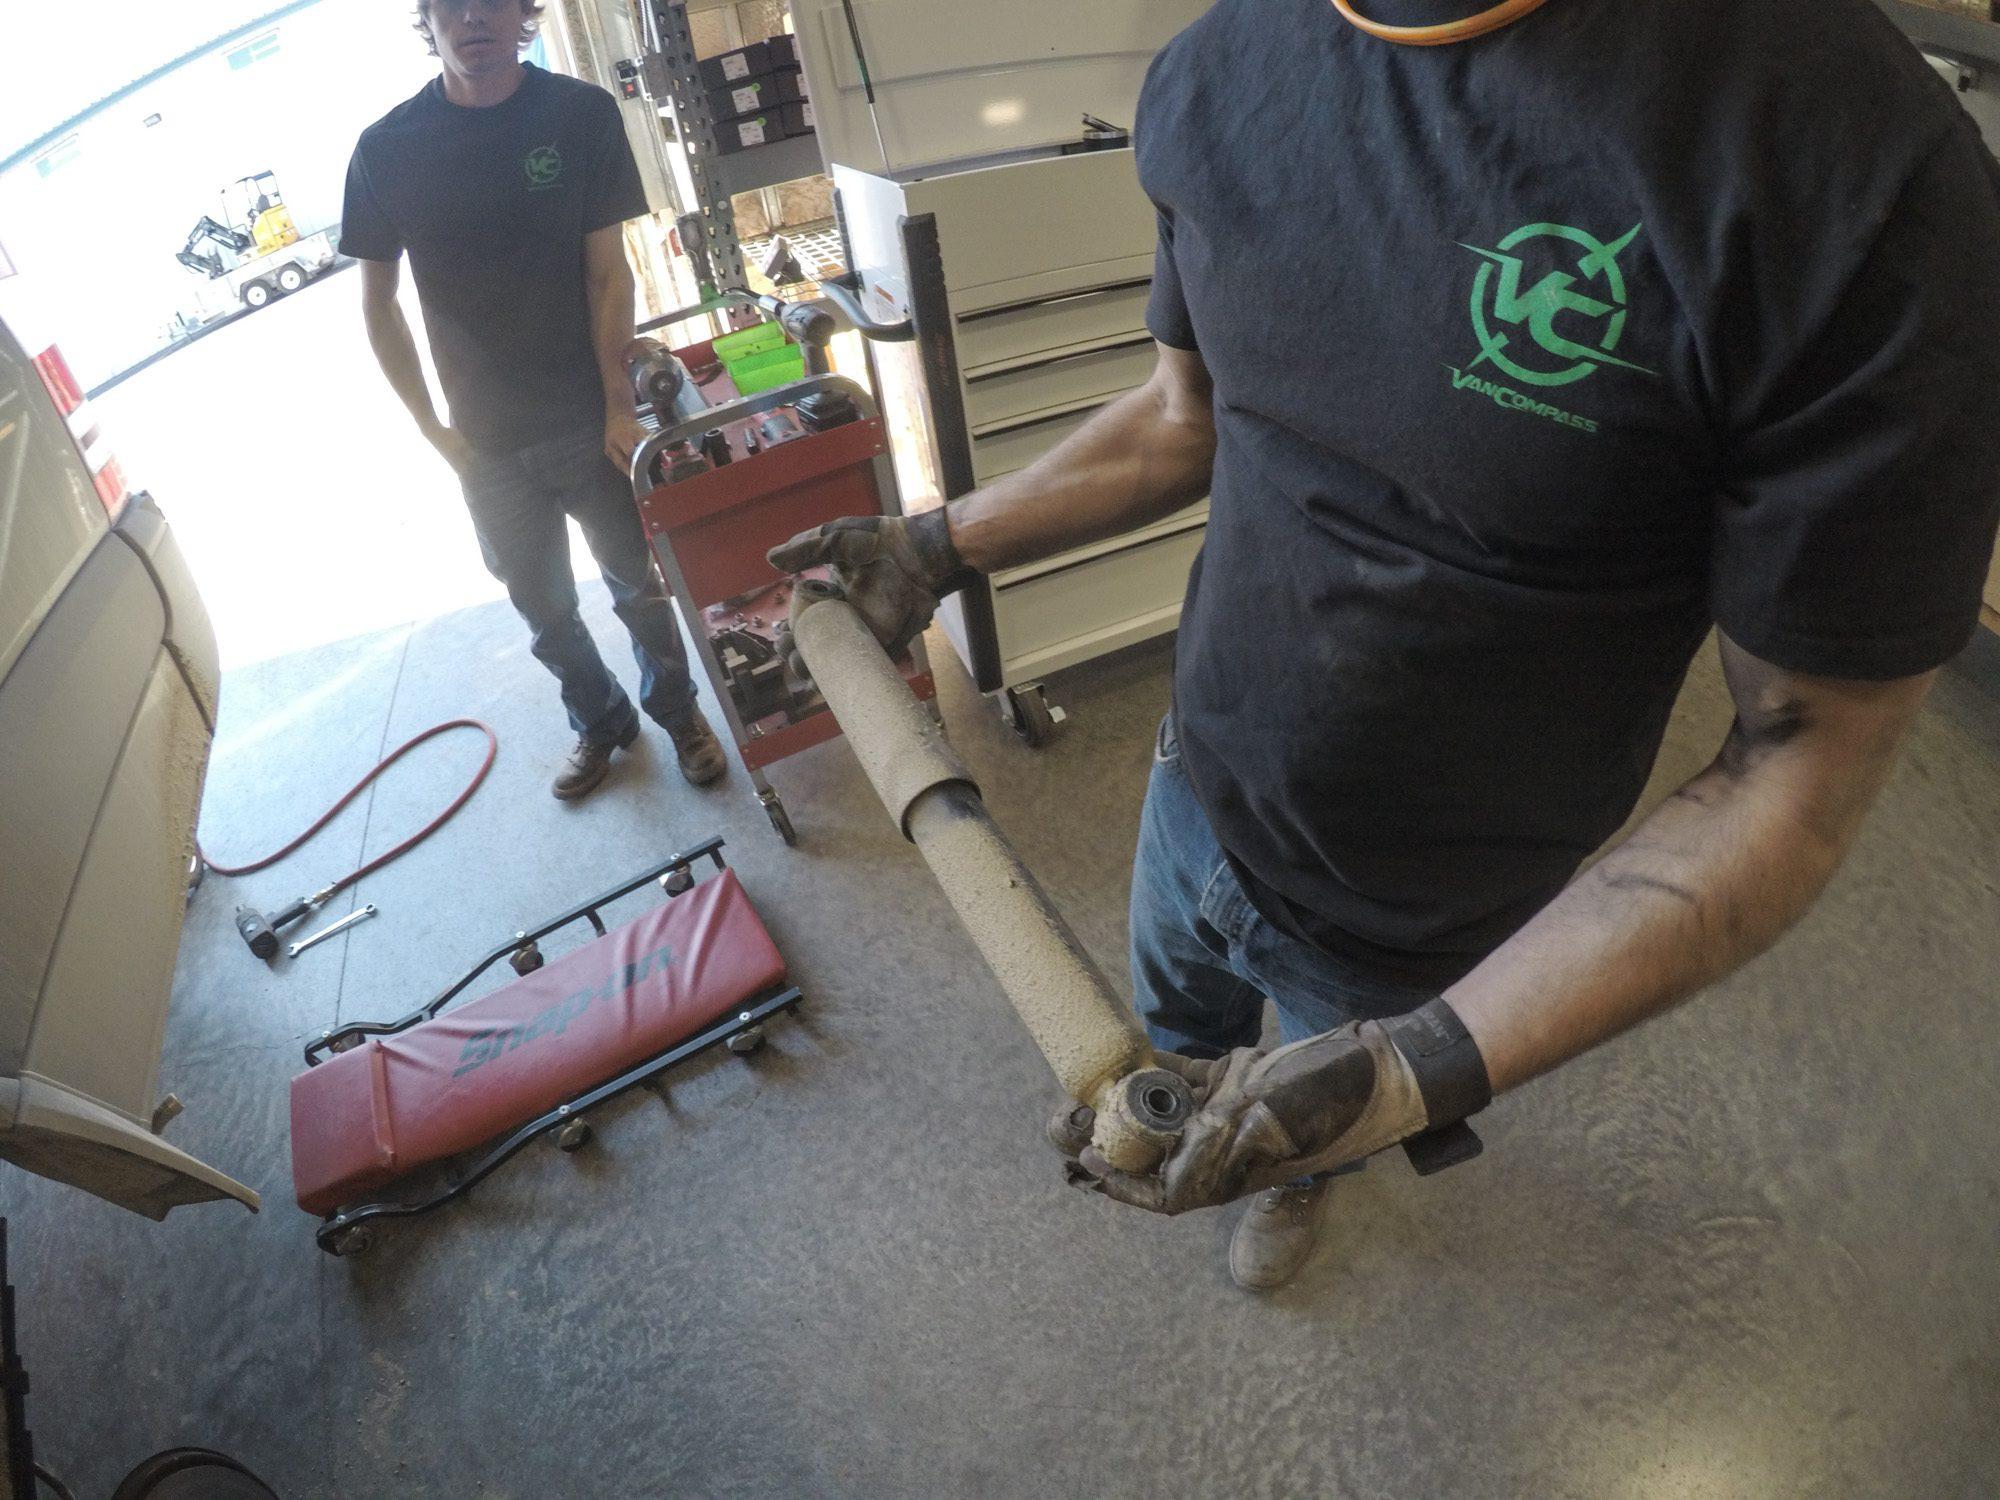 Factory shocks on a sprinter van